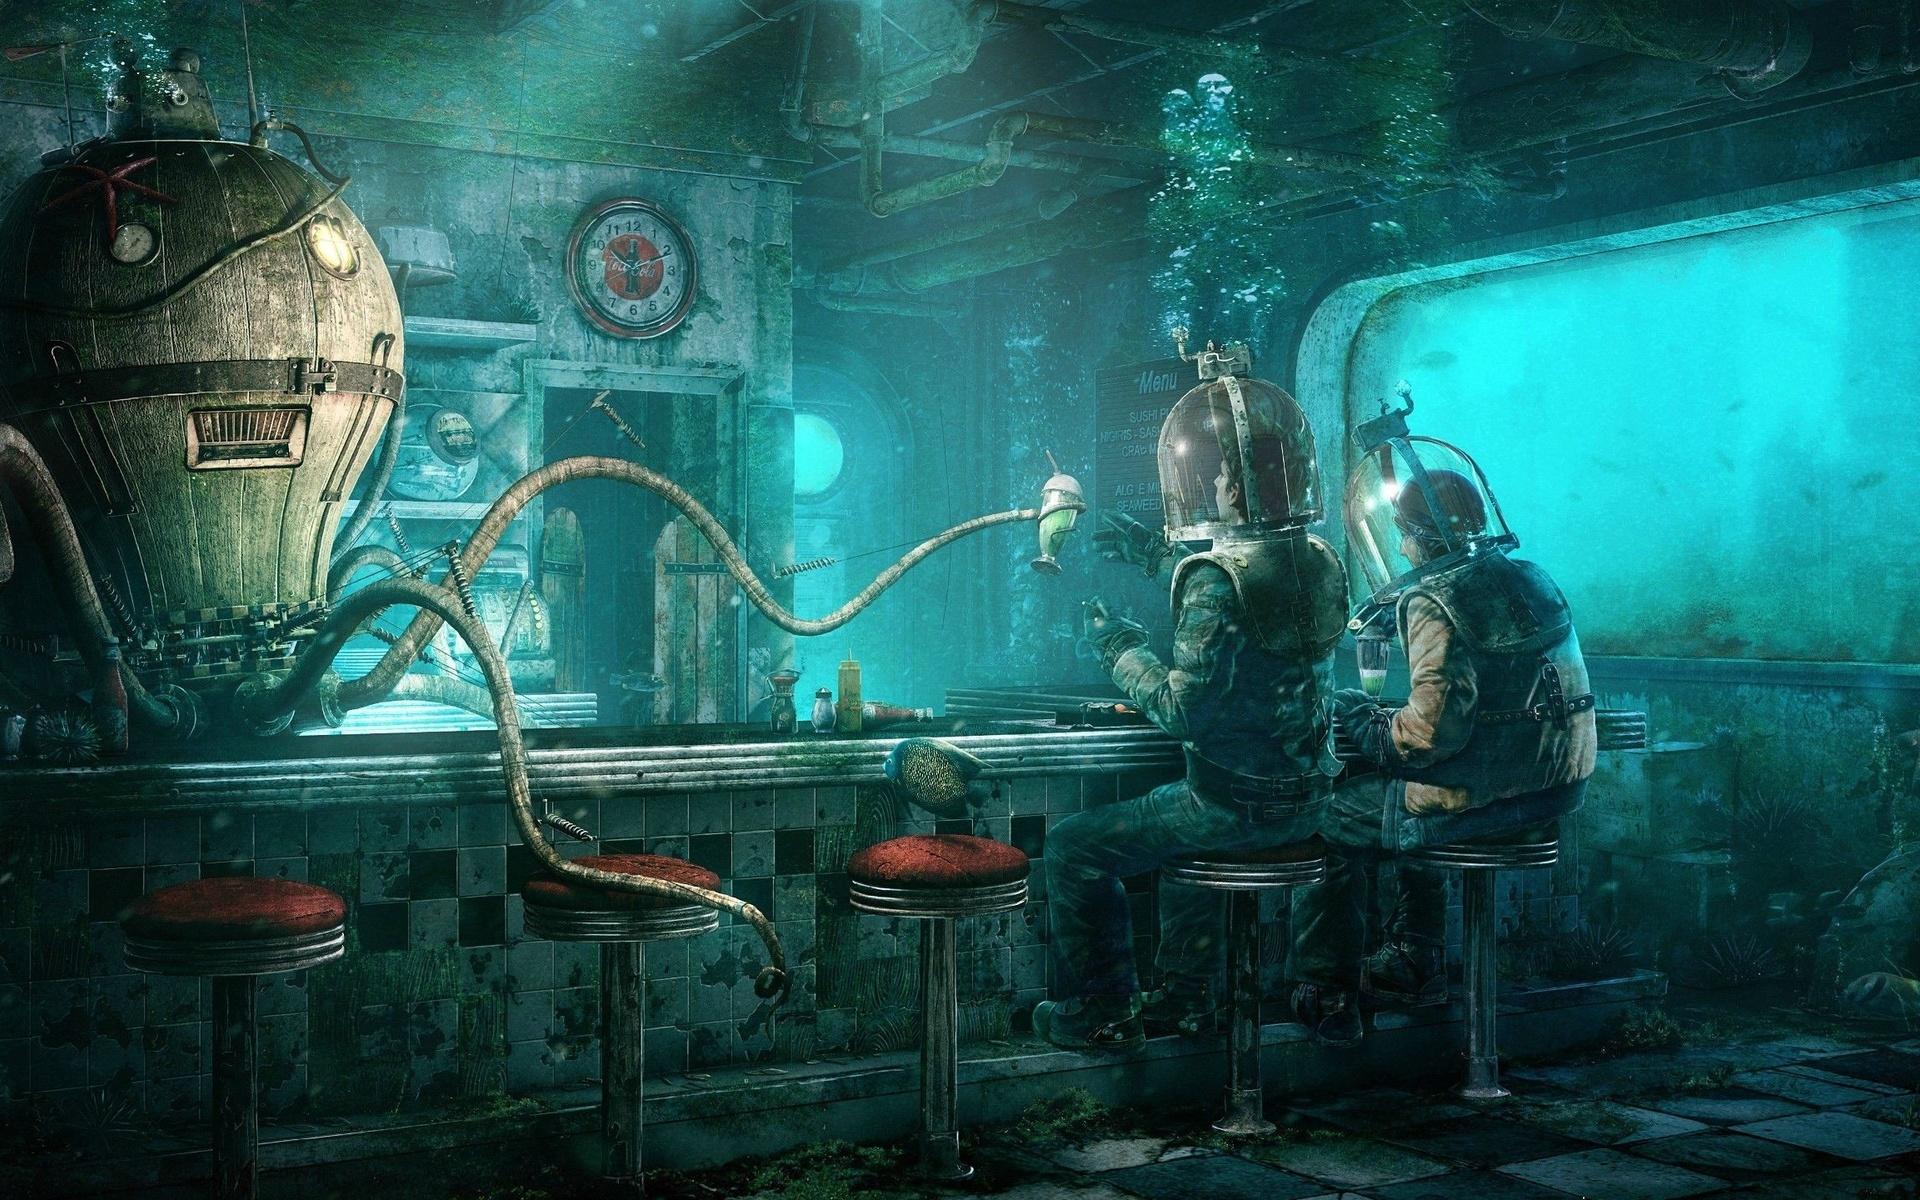 underwater restaurant, sci-fi, post-apocalyptic, sci-fi